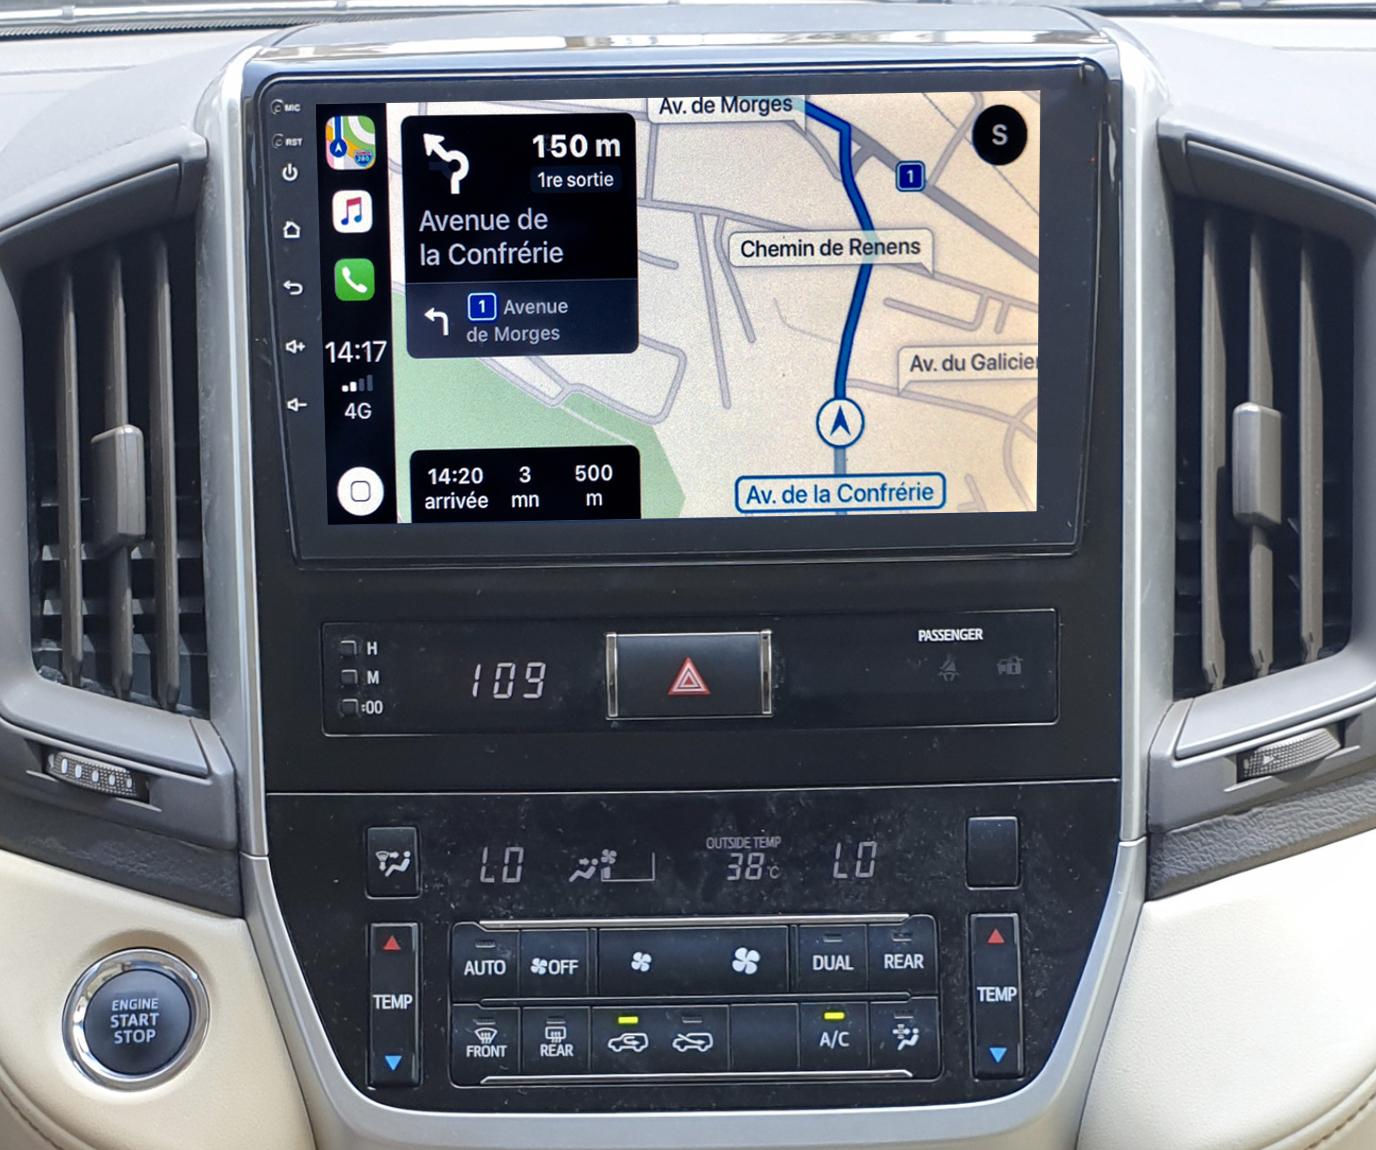 Autoradio GPS à écran tactile QLED Android 11.0 et Apple Carplay sans fil Toyota Land Cruiser depuis 2016